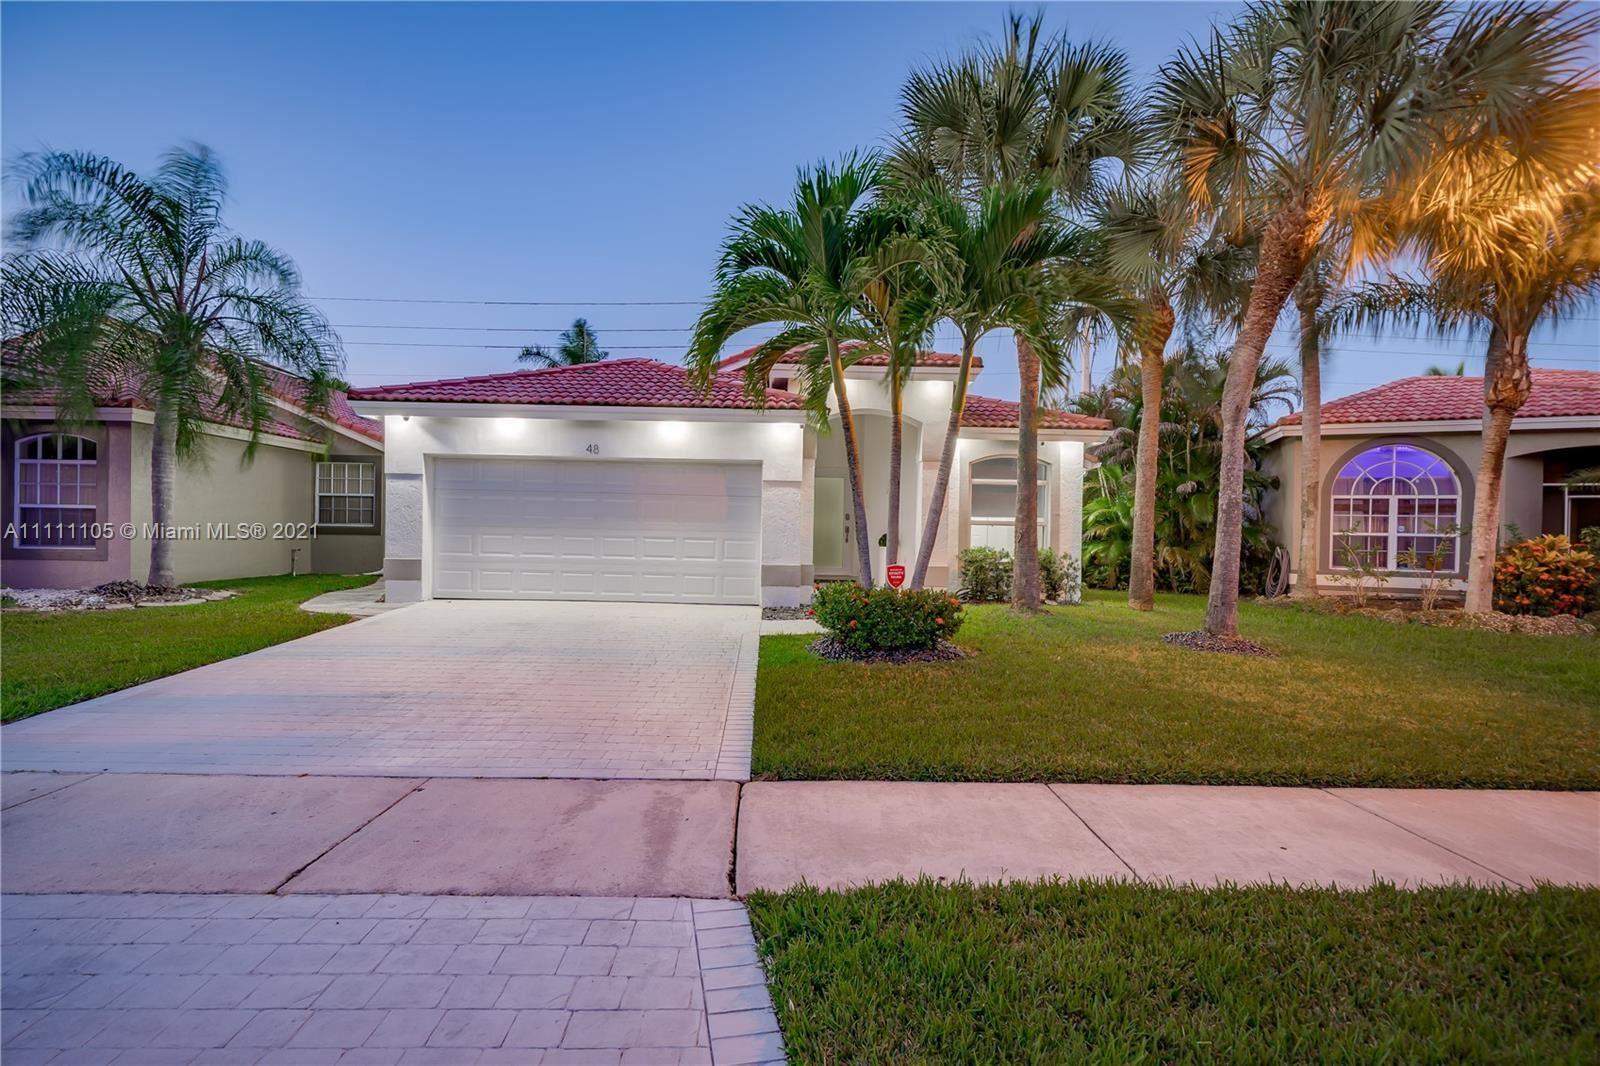 48 Gables Blvd, Weston, FL 33326 - #: A11111105